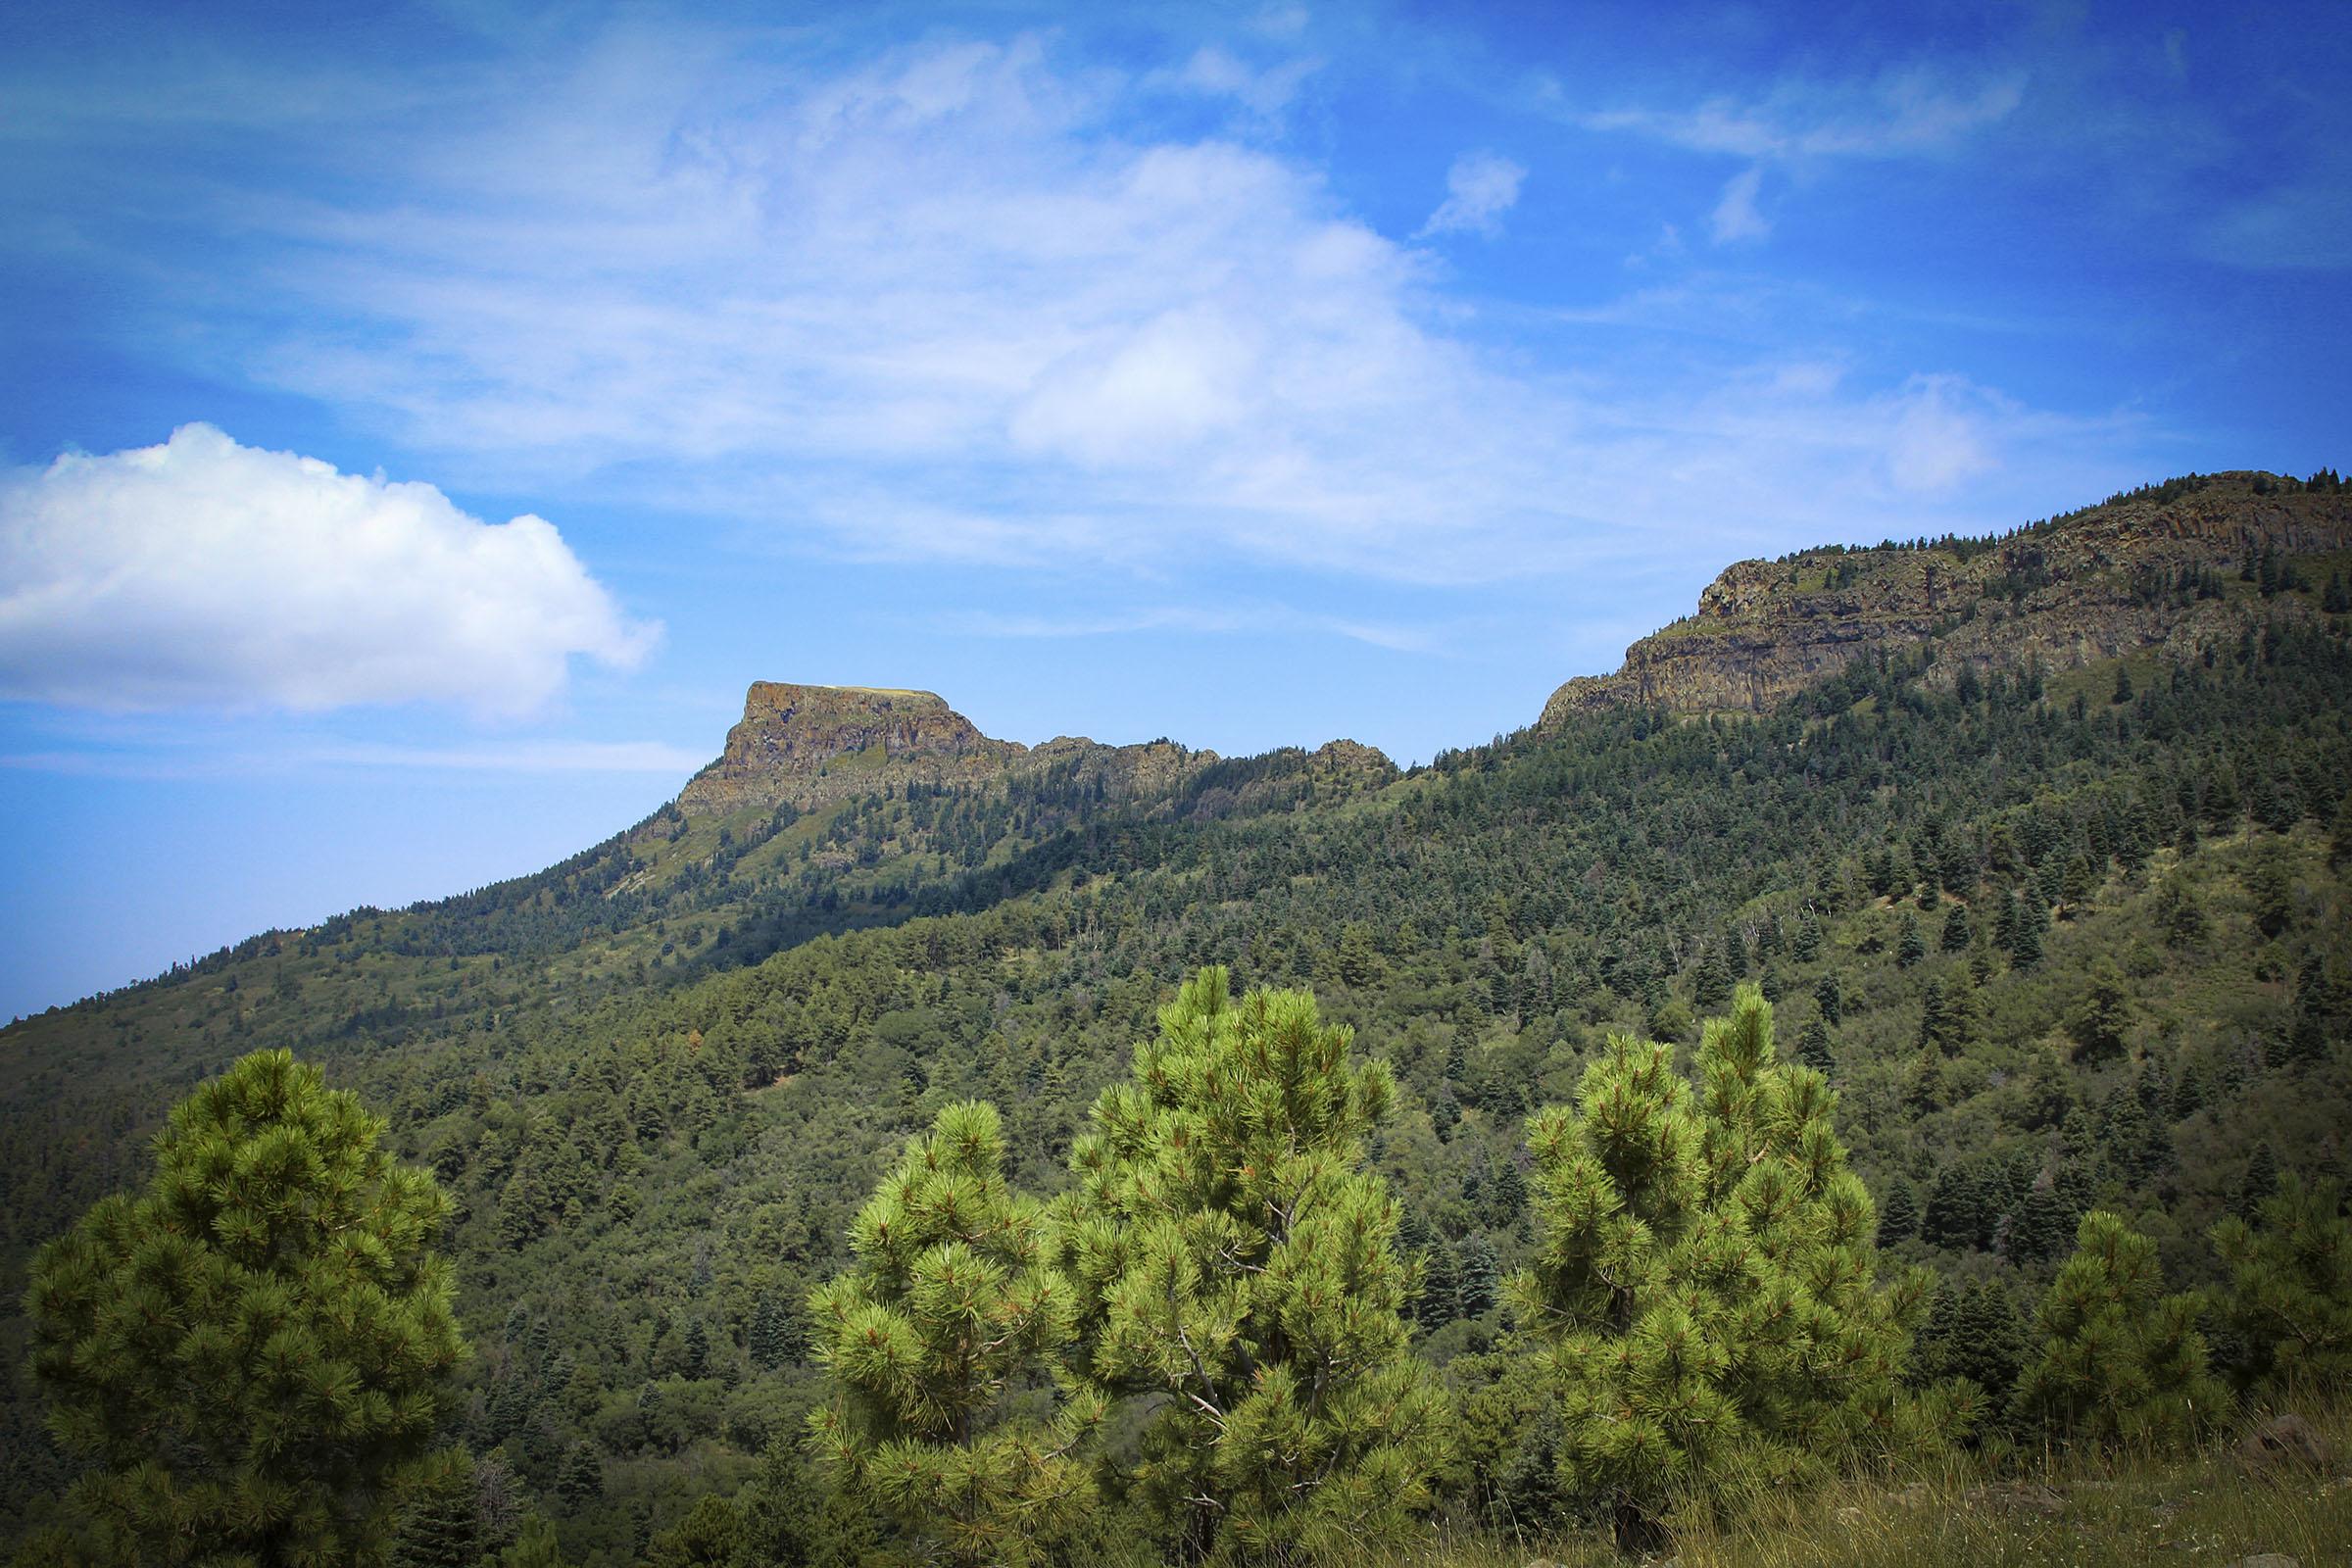 Photo: Fisher's Peak outside of Trinidad, Colorado (Courtesy)